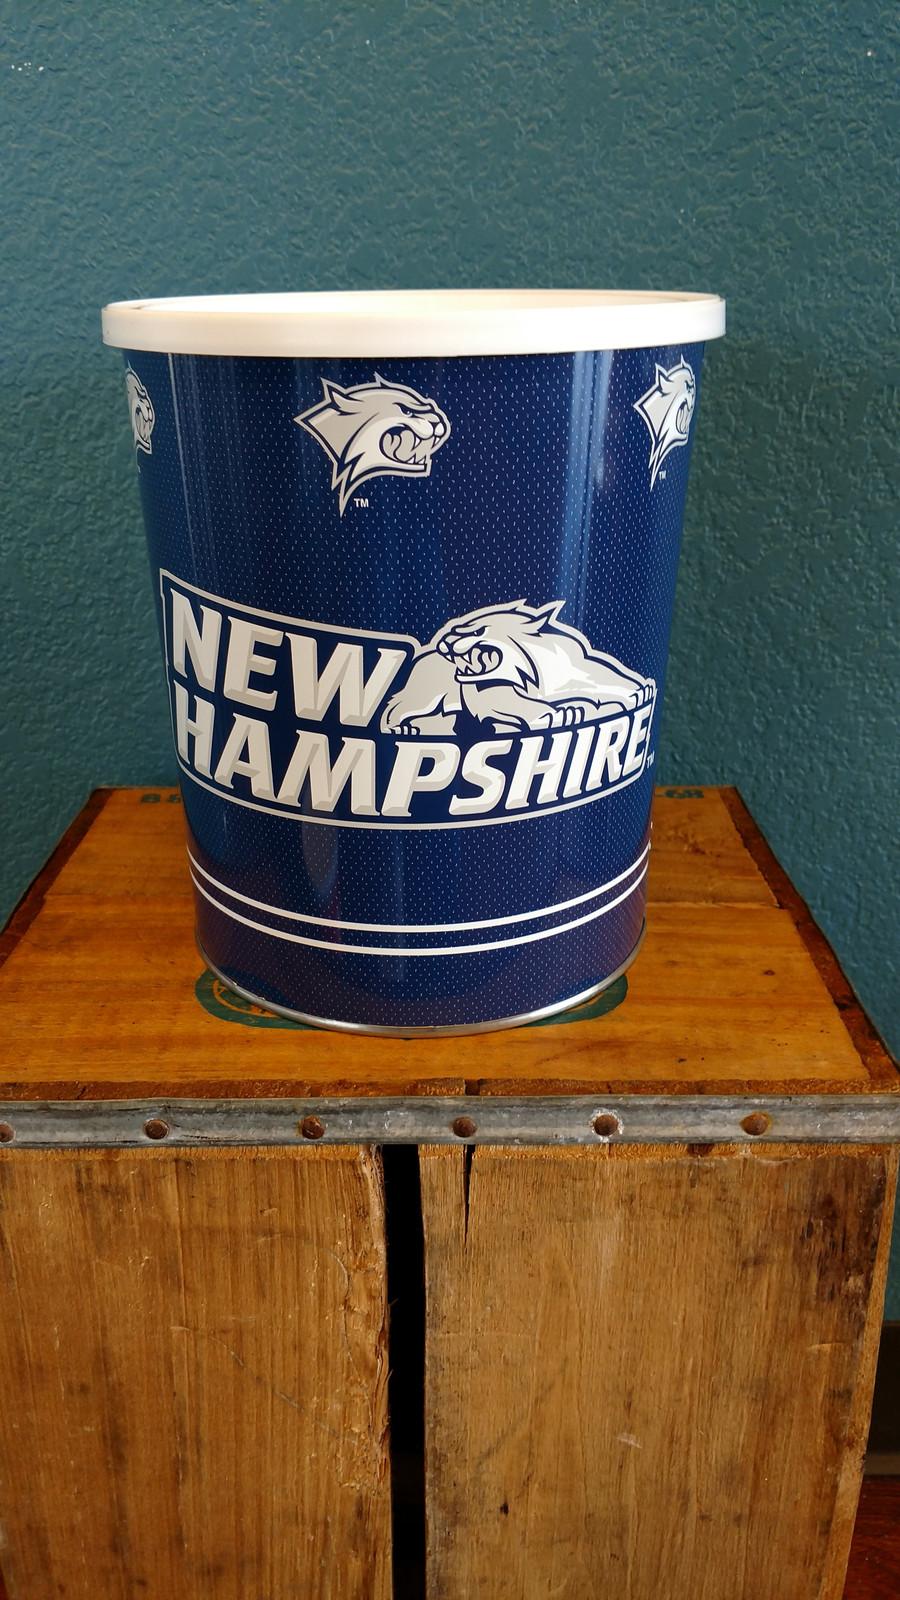 New Hampshire 1 Gallon Popcorn TIn